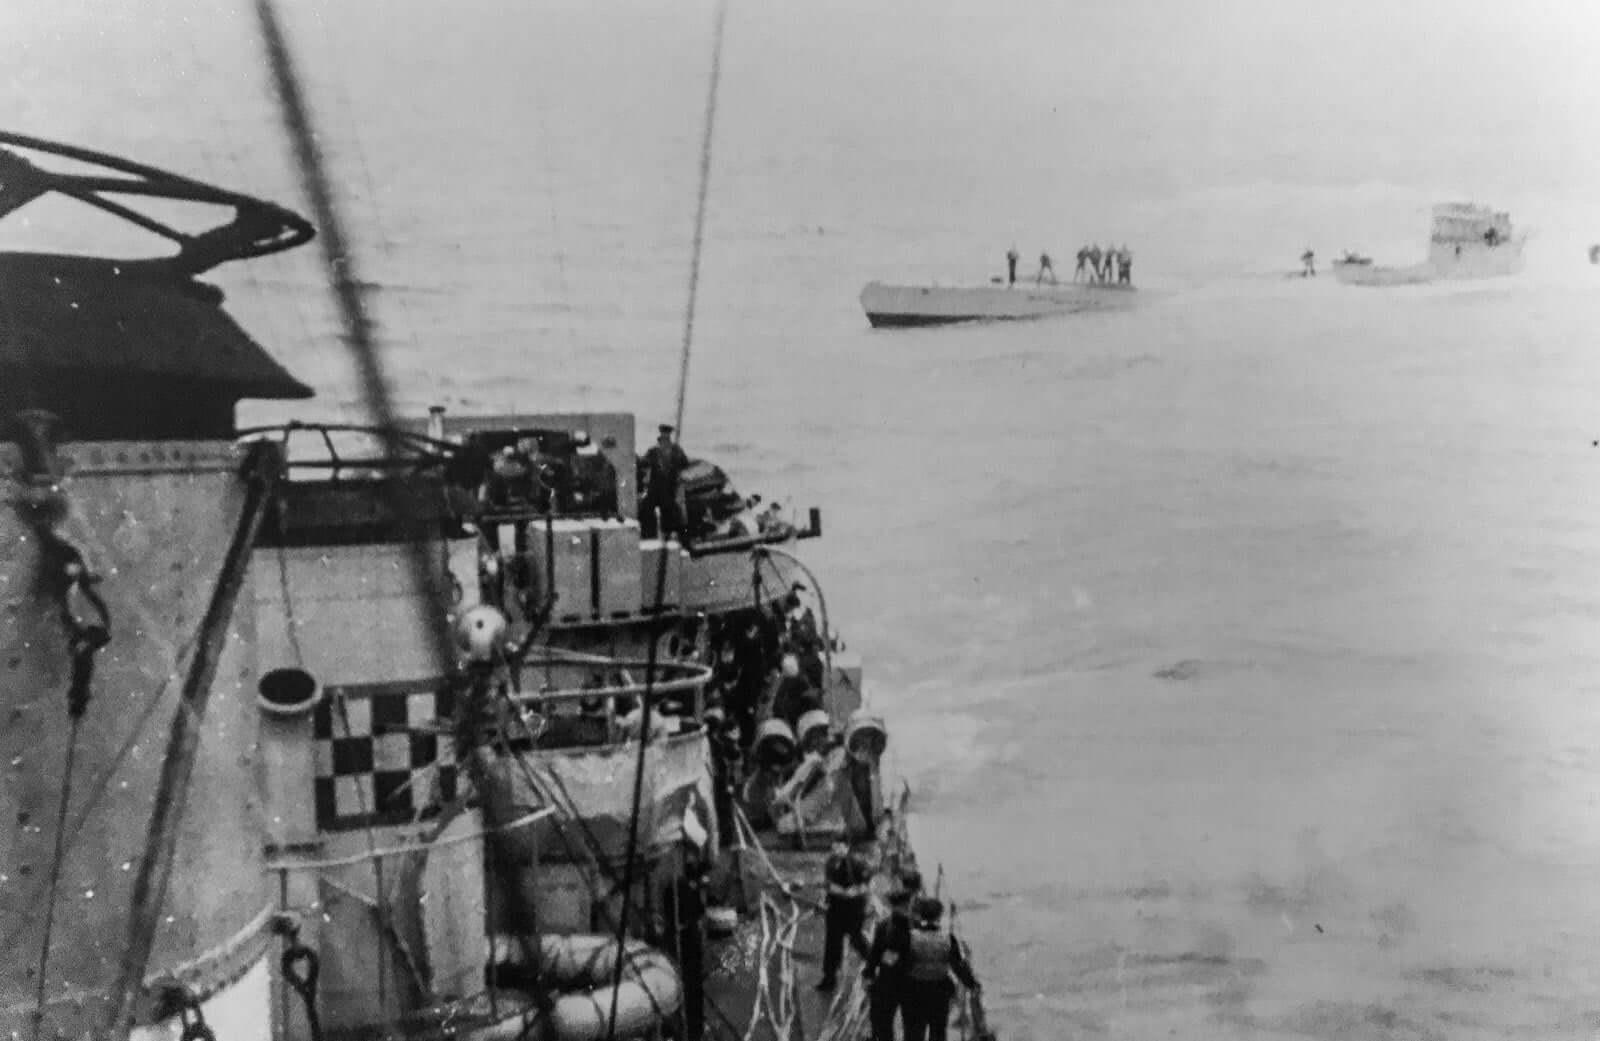 U110 submarine surfaced from the deck of HMS Bulldog